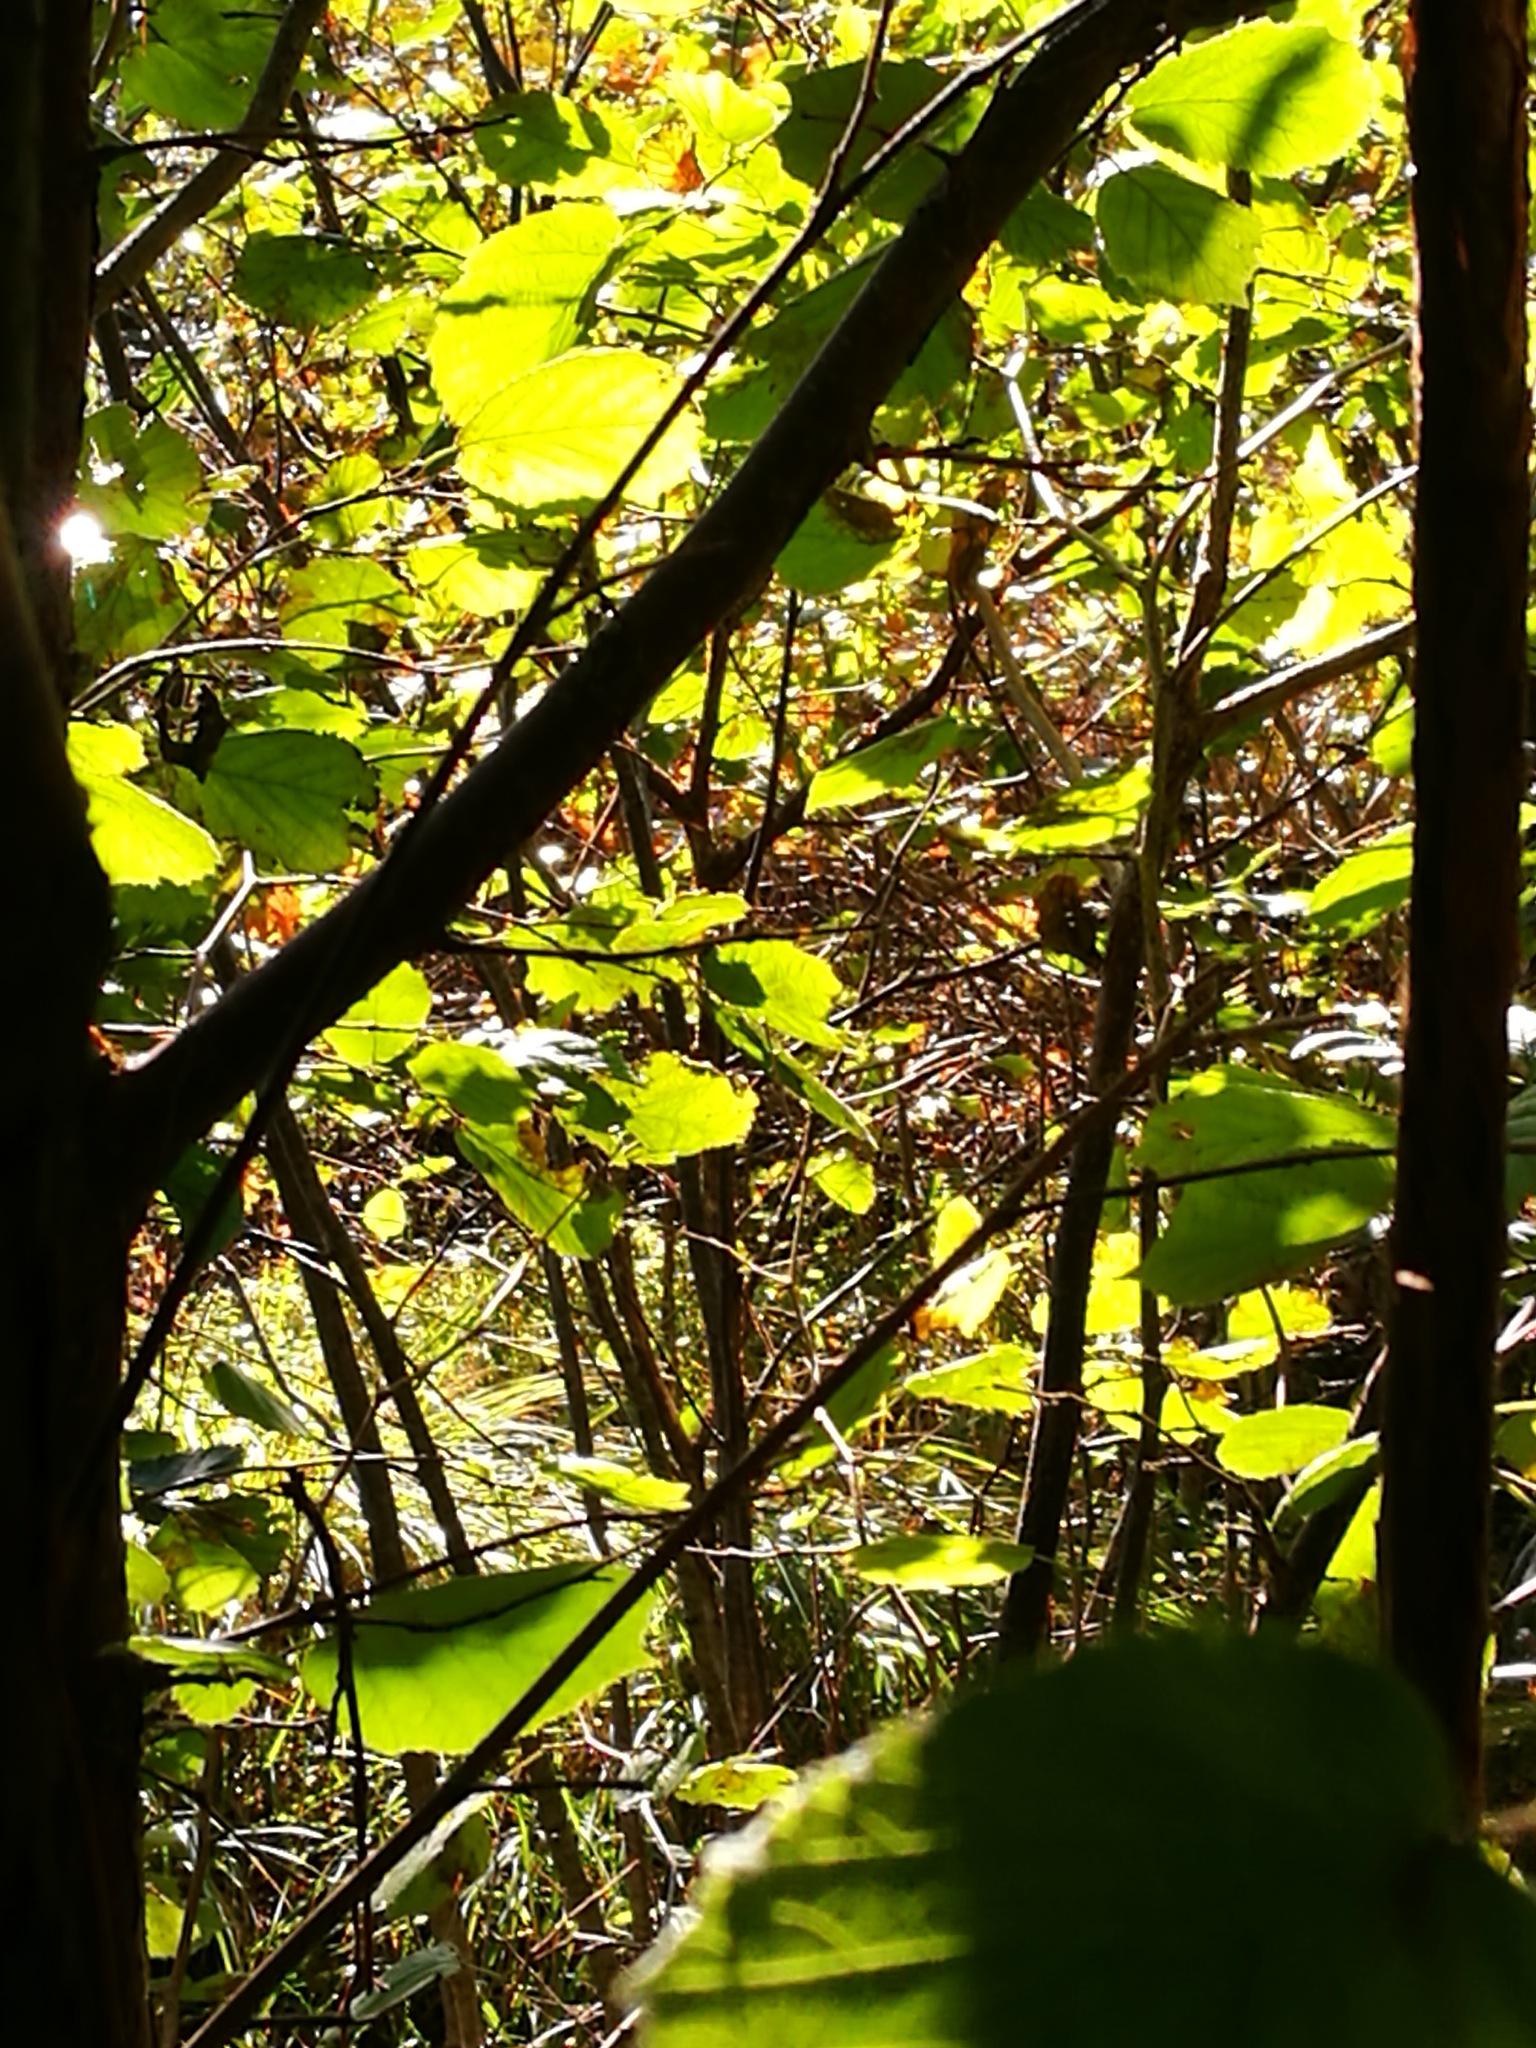 Morningsun in the leaves by Per Herigstad